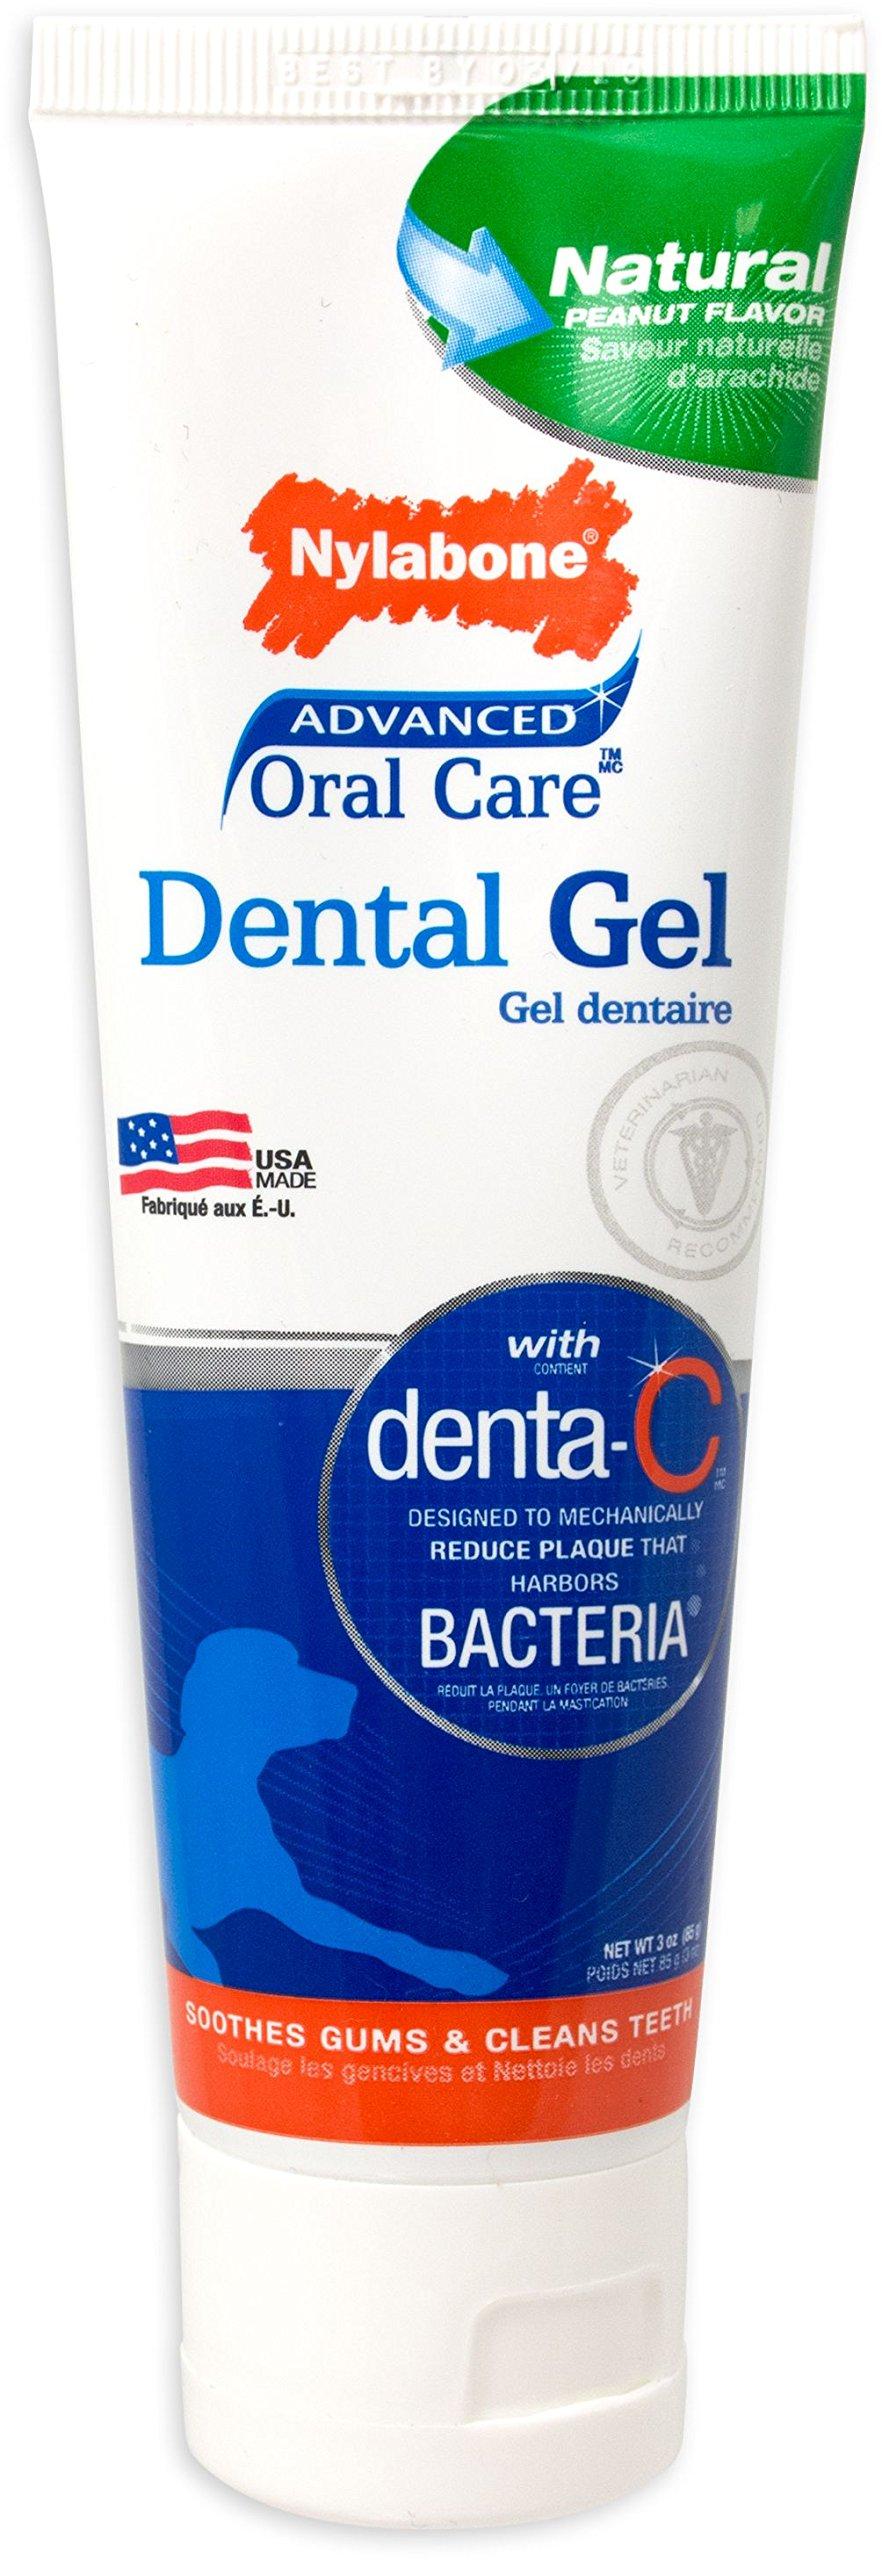 Nylabone Advanced Oral Care Triple-Action Toothbrush & Dental Gel, 1ct